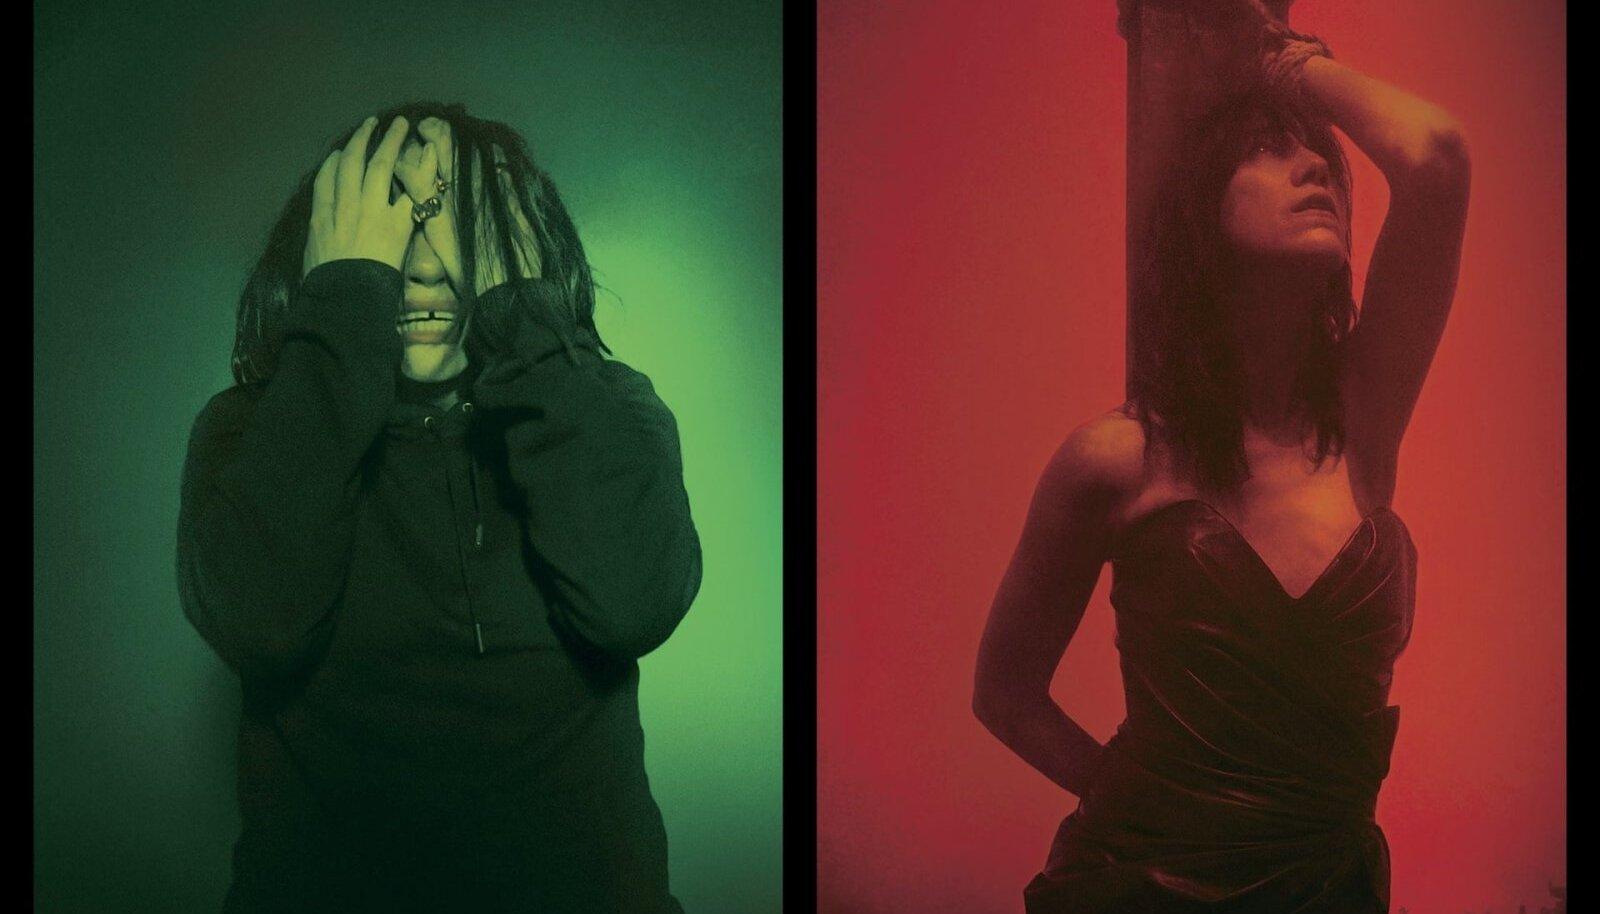 SEKSISÜMBOLID: Gaspar Noé uue filmi peategelased on Charlotte (Charlotte Gainsbourg, paremal) ja Béatrice (Béatrice Dalle).